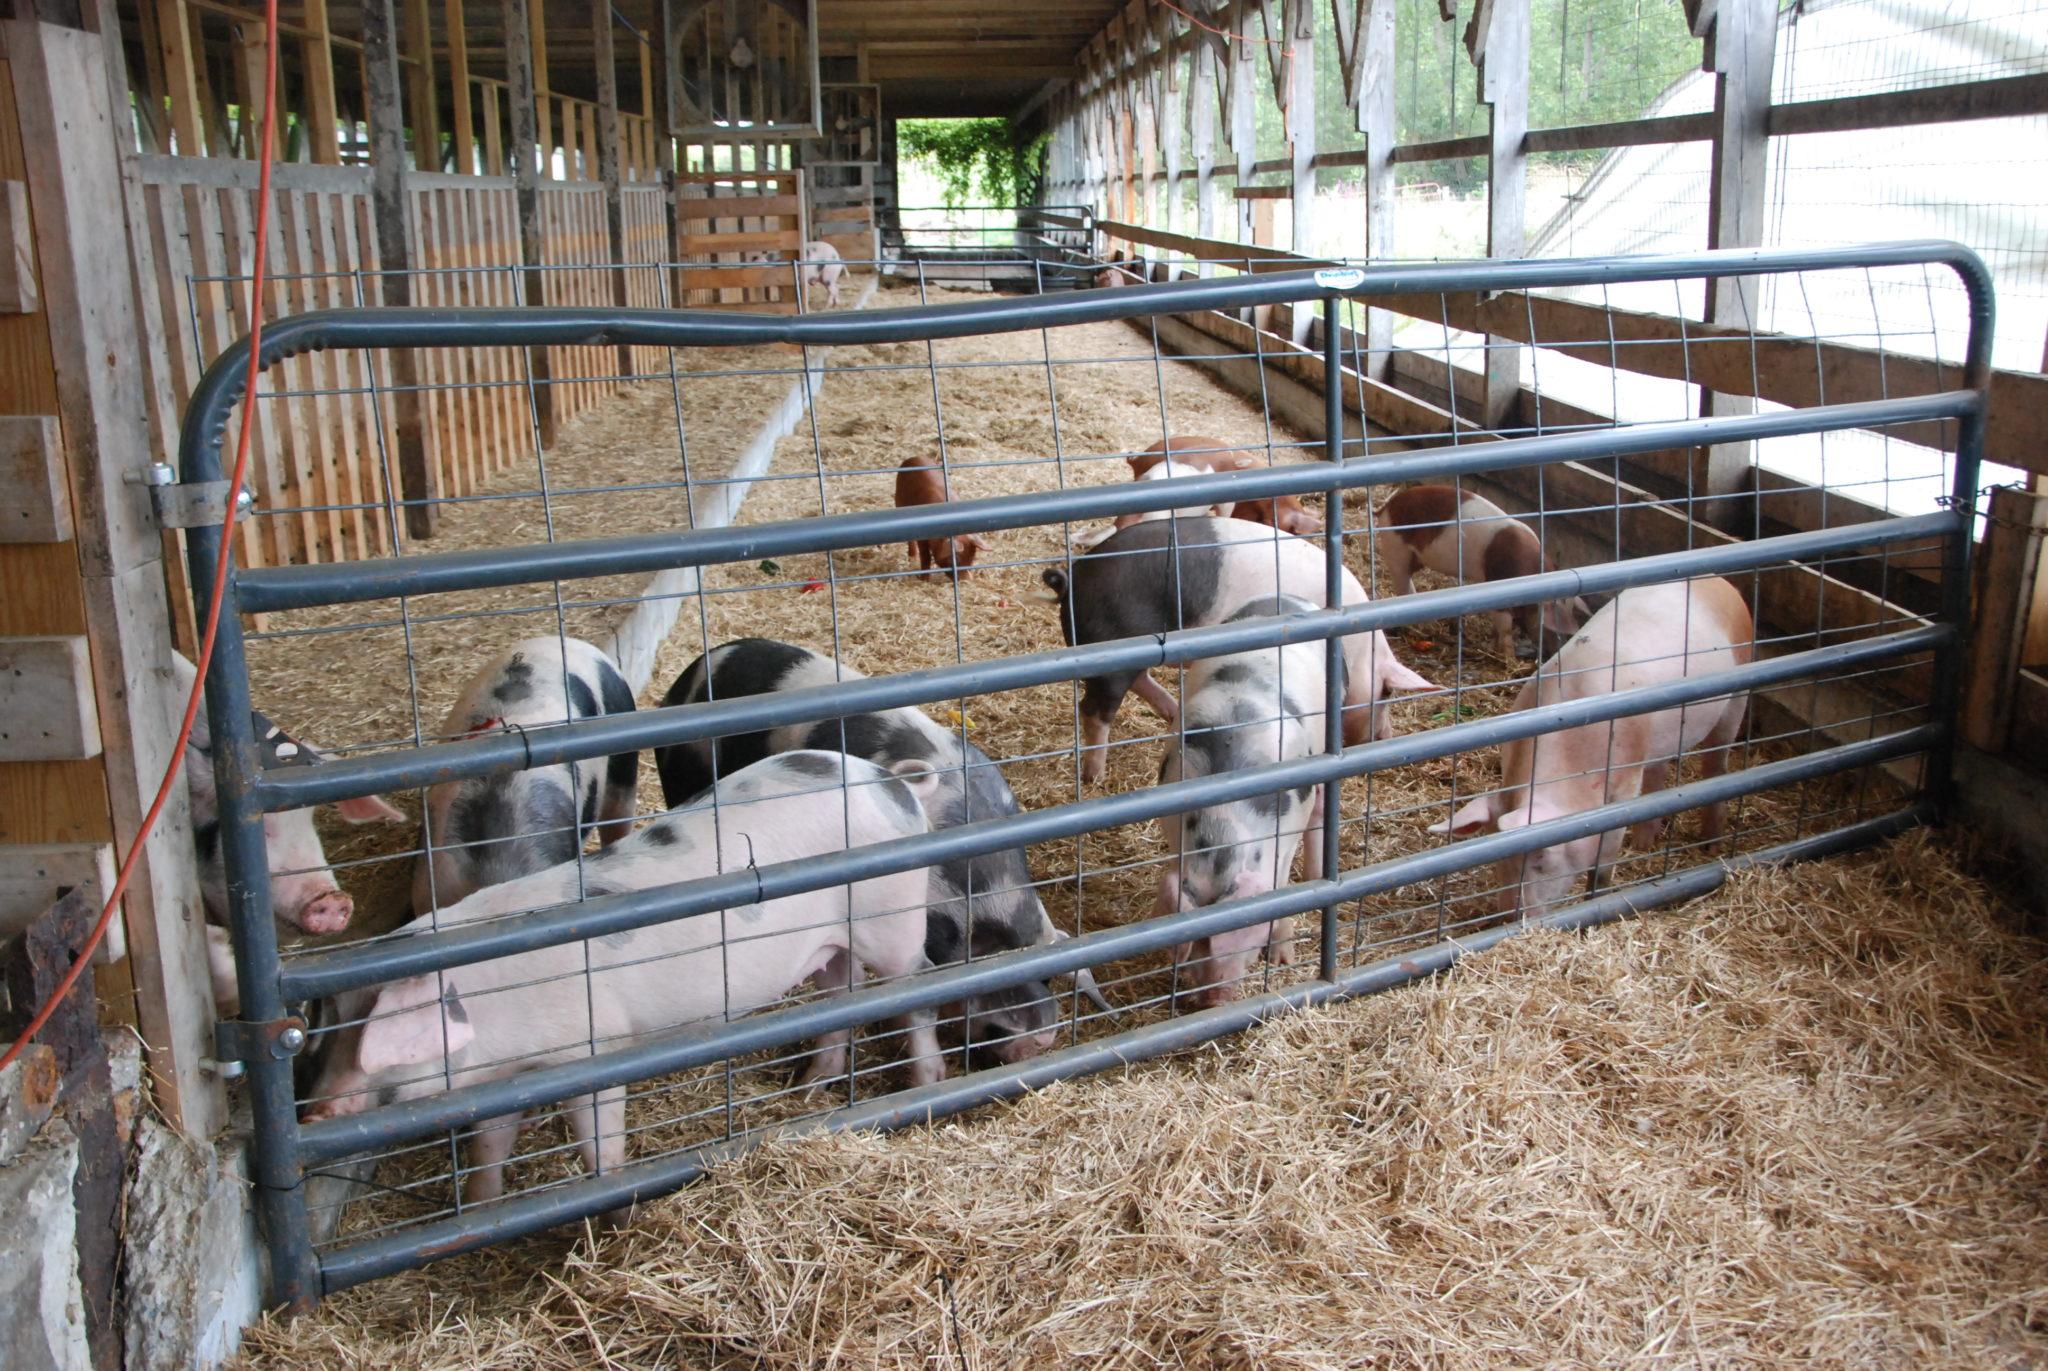 Village debates, OKs pig farm